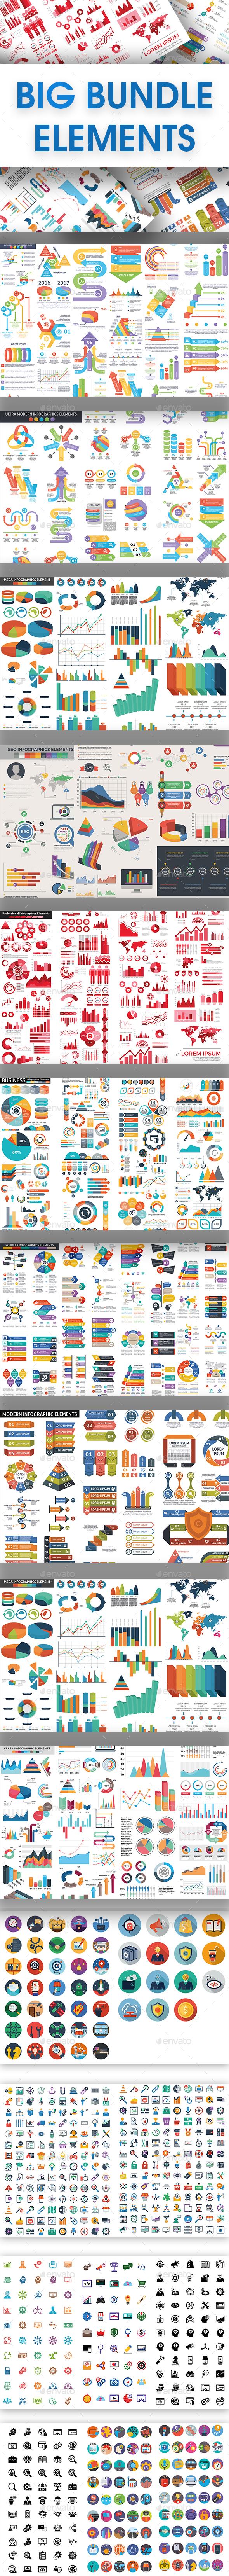 GraphicRiver Big Bundle Elements 20319094